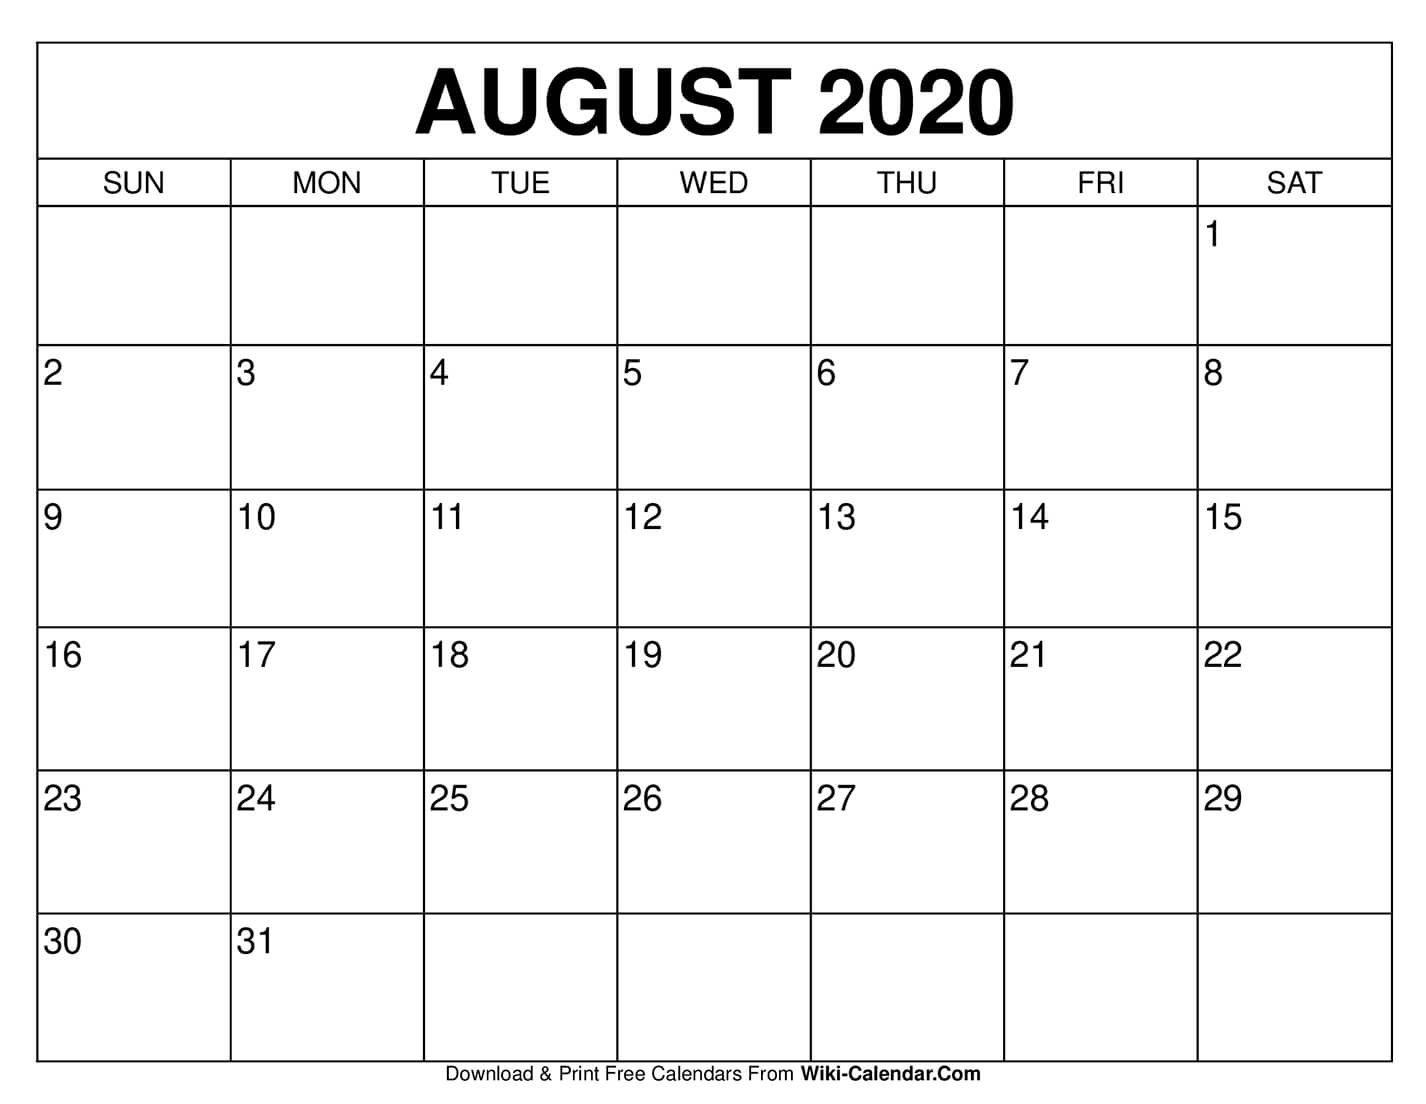 Free Printable August 2020 Calendars Free Calendar To Edit